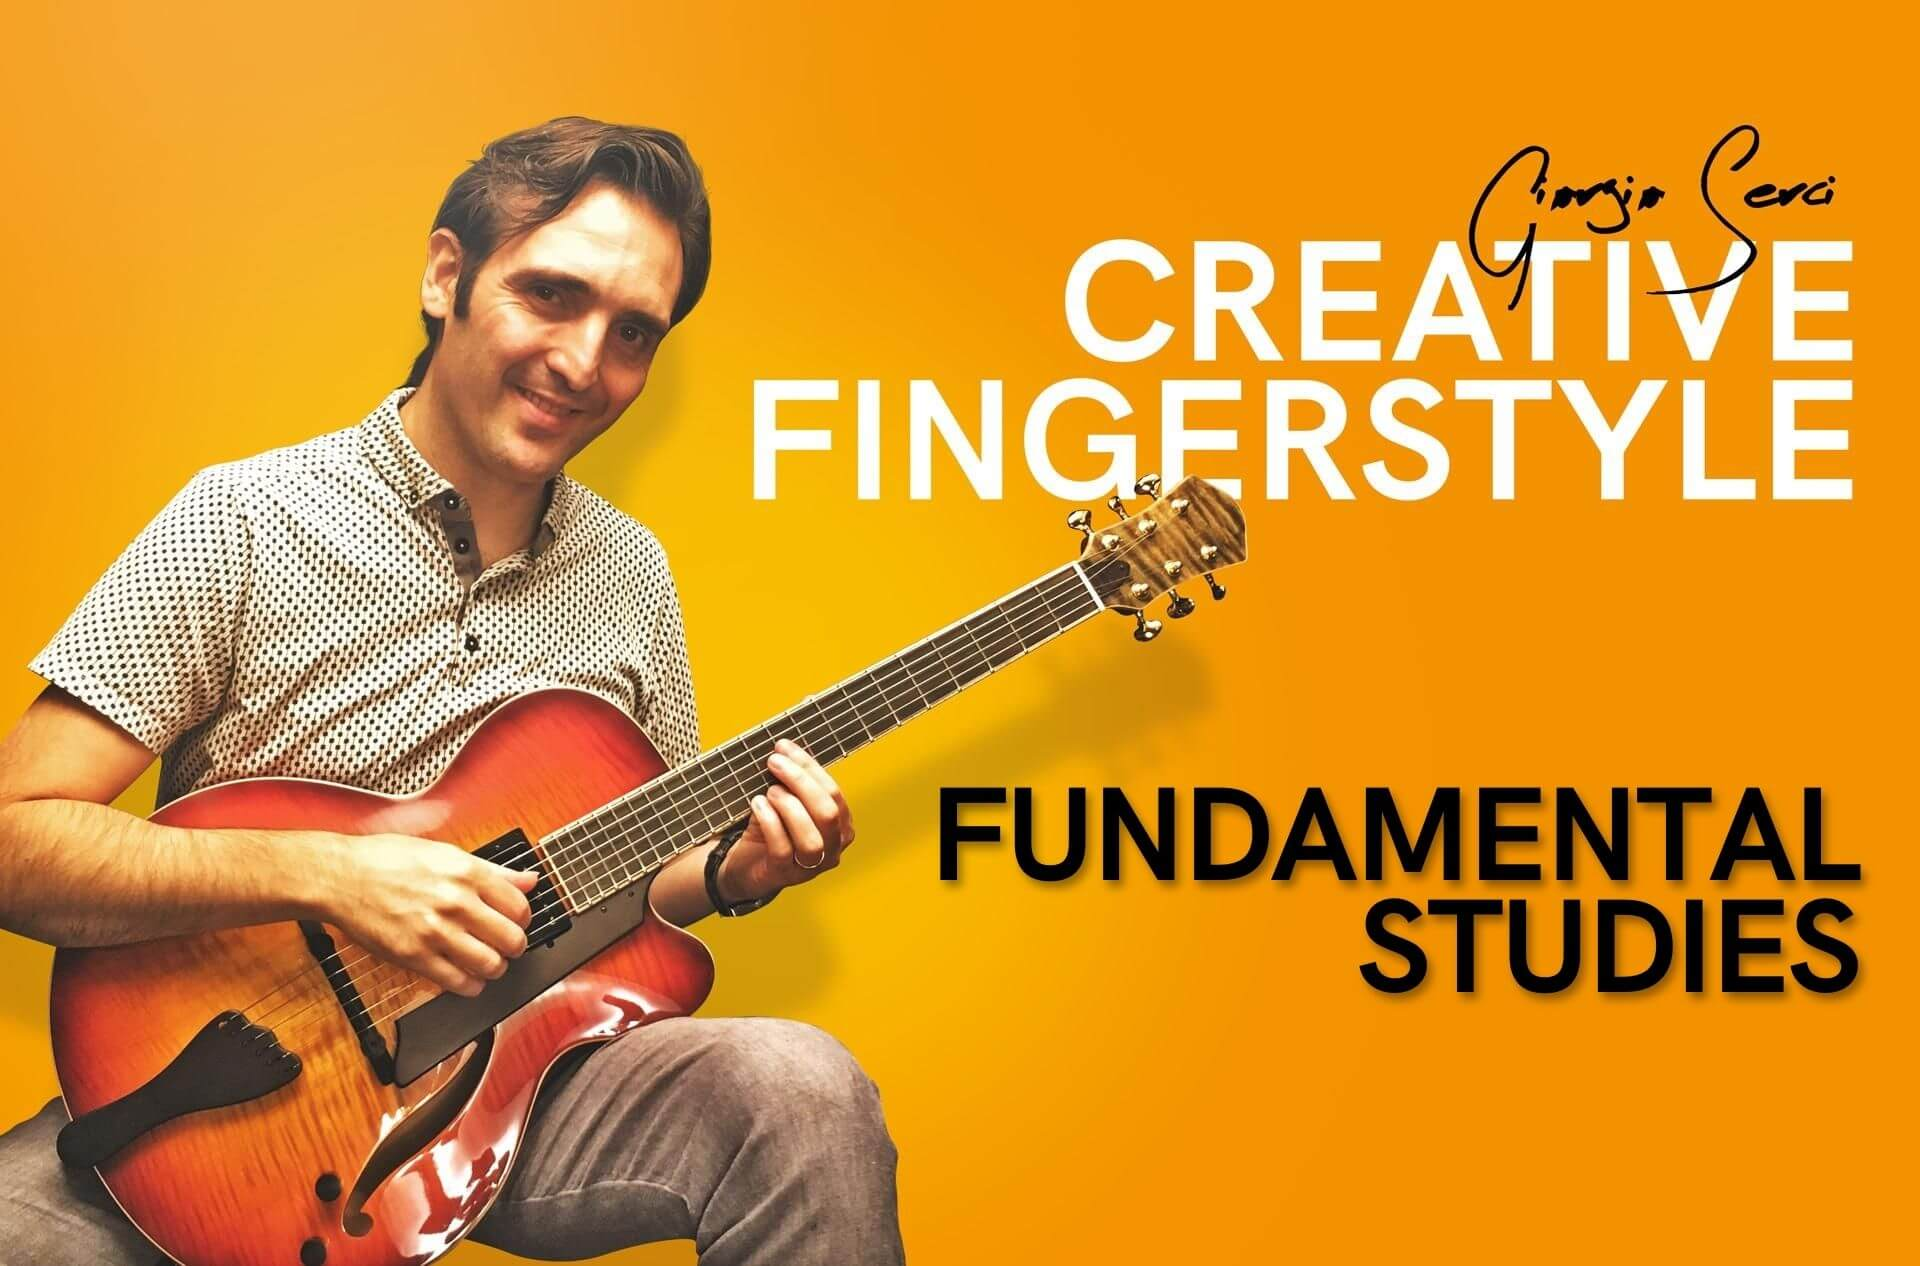 Georgio Serci - Creative Fingerstyle Fundamental Studies